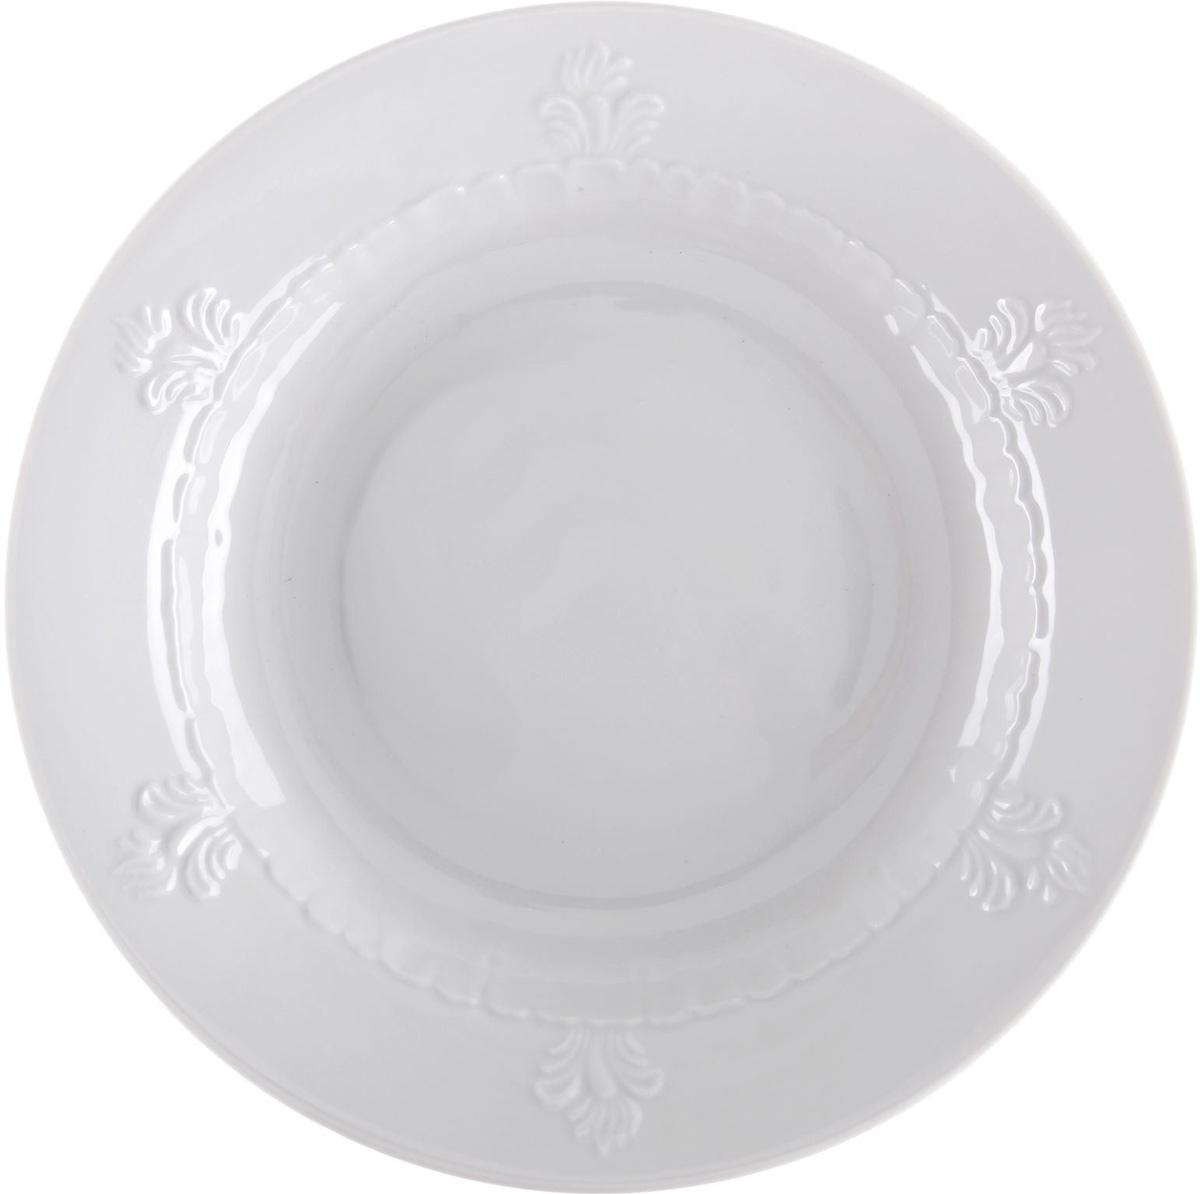 Тарелка глубокая Фарфор Вербилок, диаметр 23,5 см. 1344134 блюдо для яиц фарфор вербилок розовые герберы 26351660уп